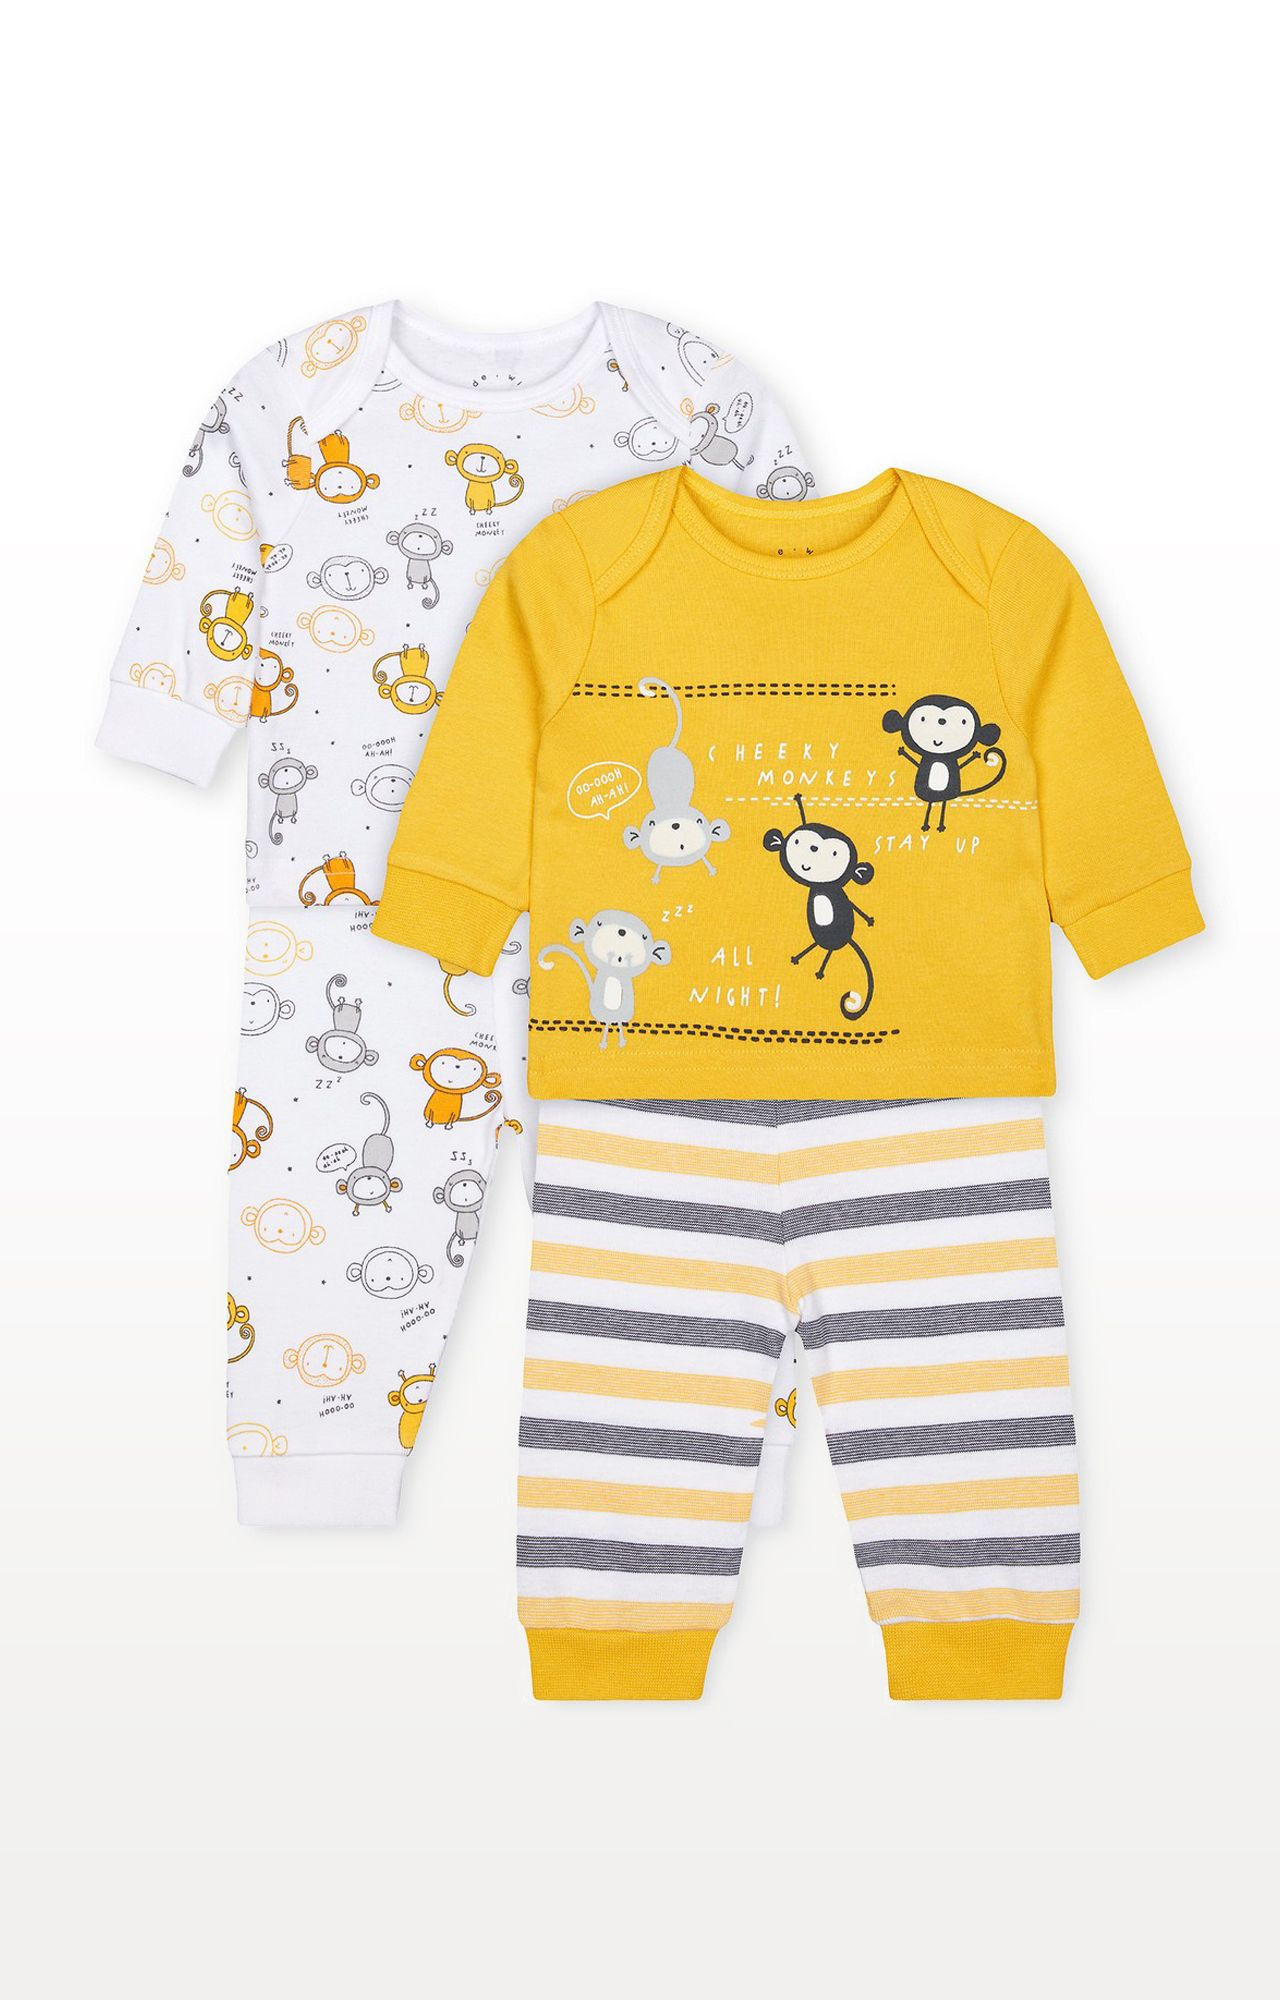 Mothercare | Cheeky Monkeys Pyjamas - Pack of 2